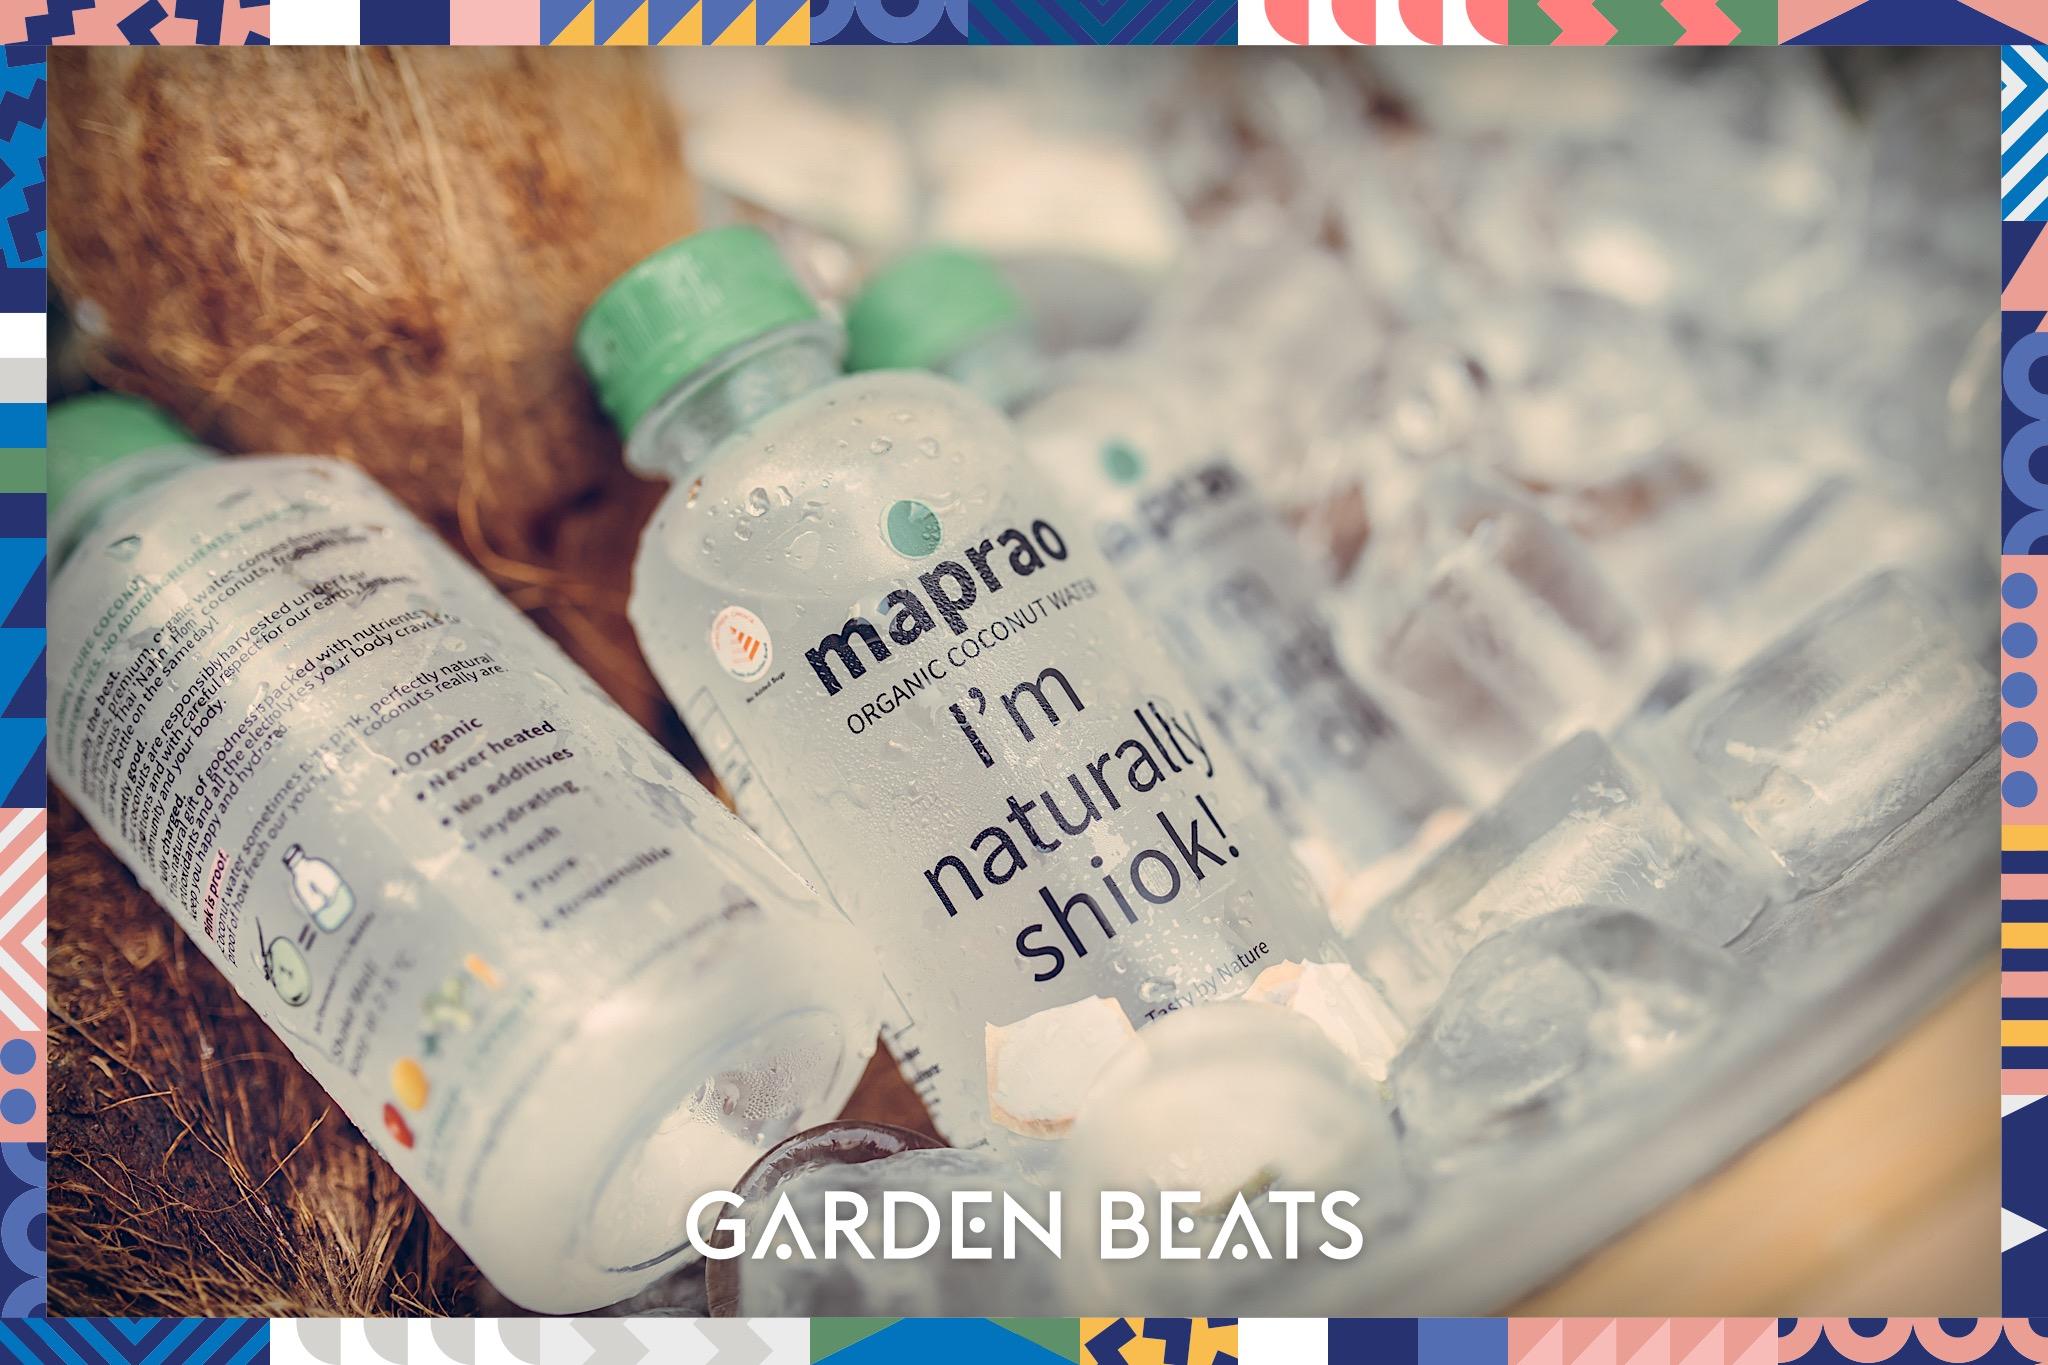 03032018_GardenBeats_Colossal136_Watermarked.jpg